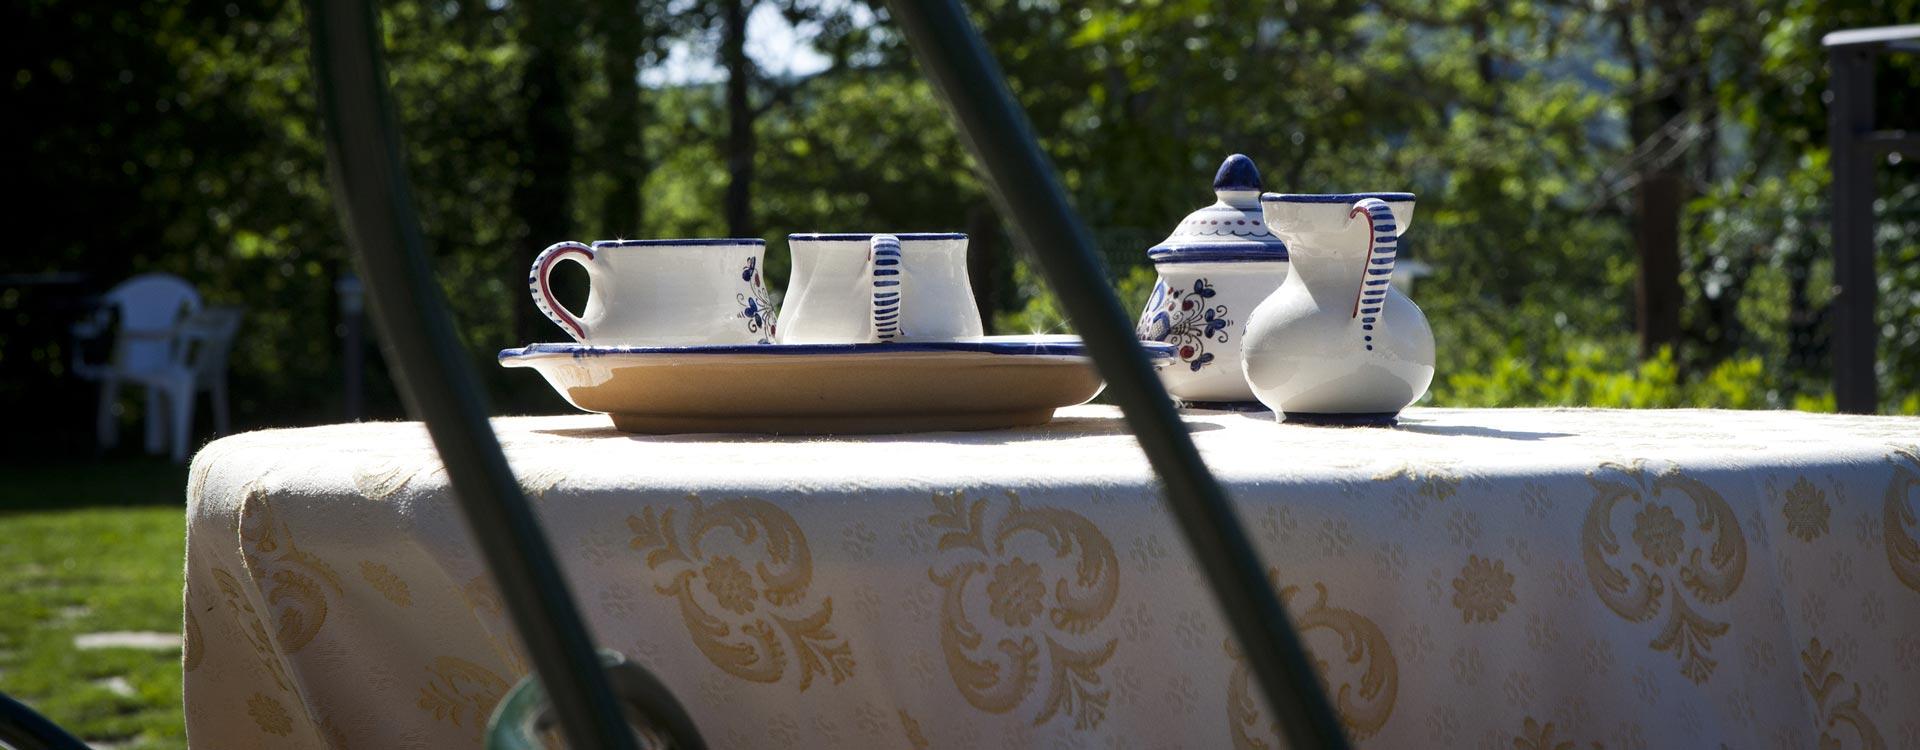 Agriturismo Assisi 'Relais Parco del Subasio' - Ideale per il relax